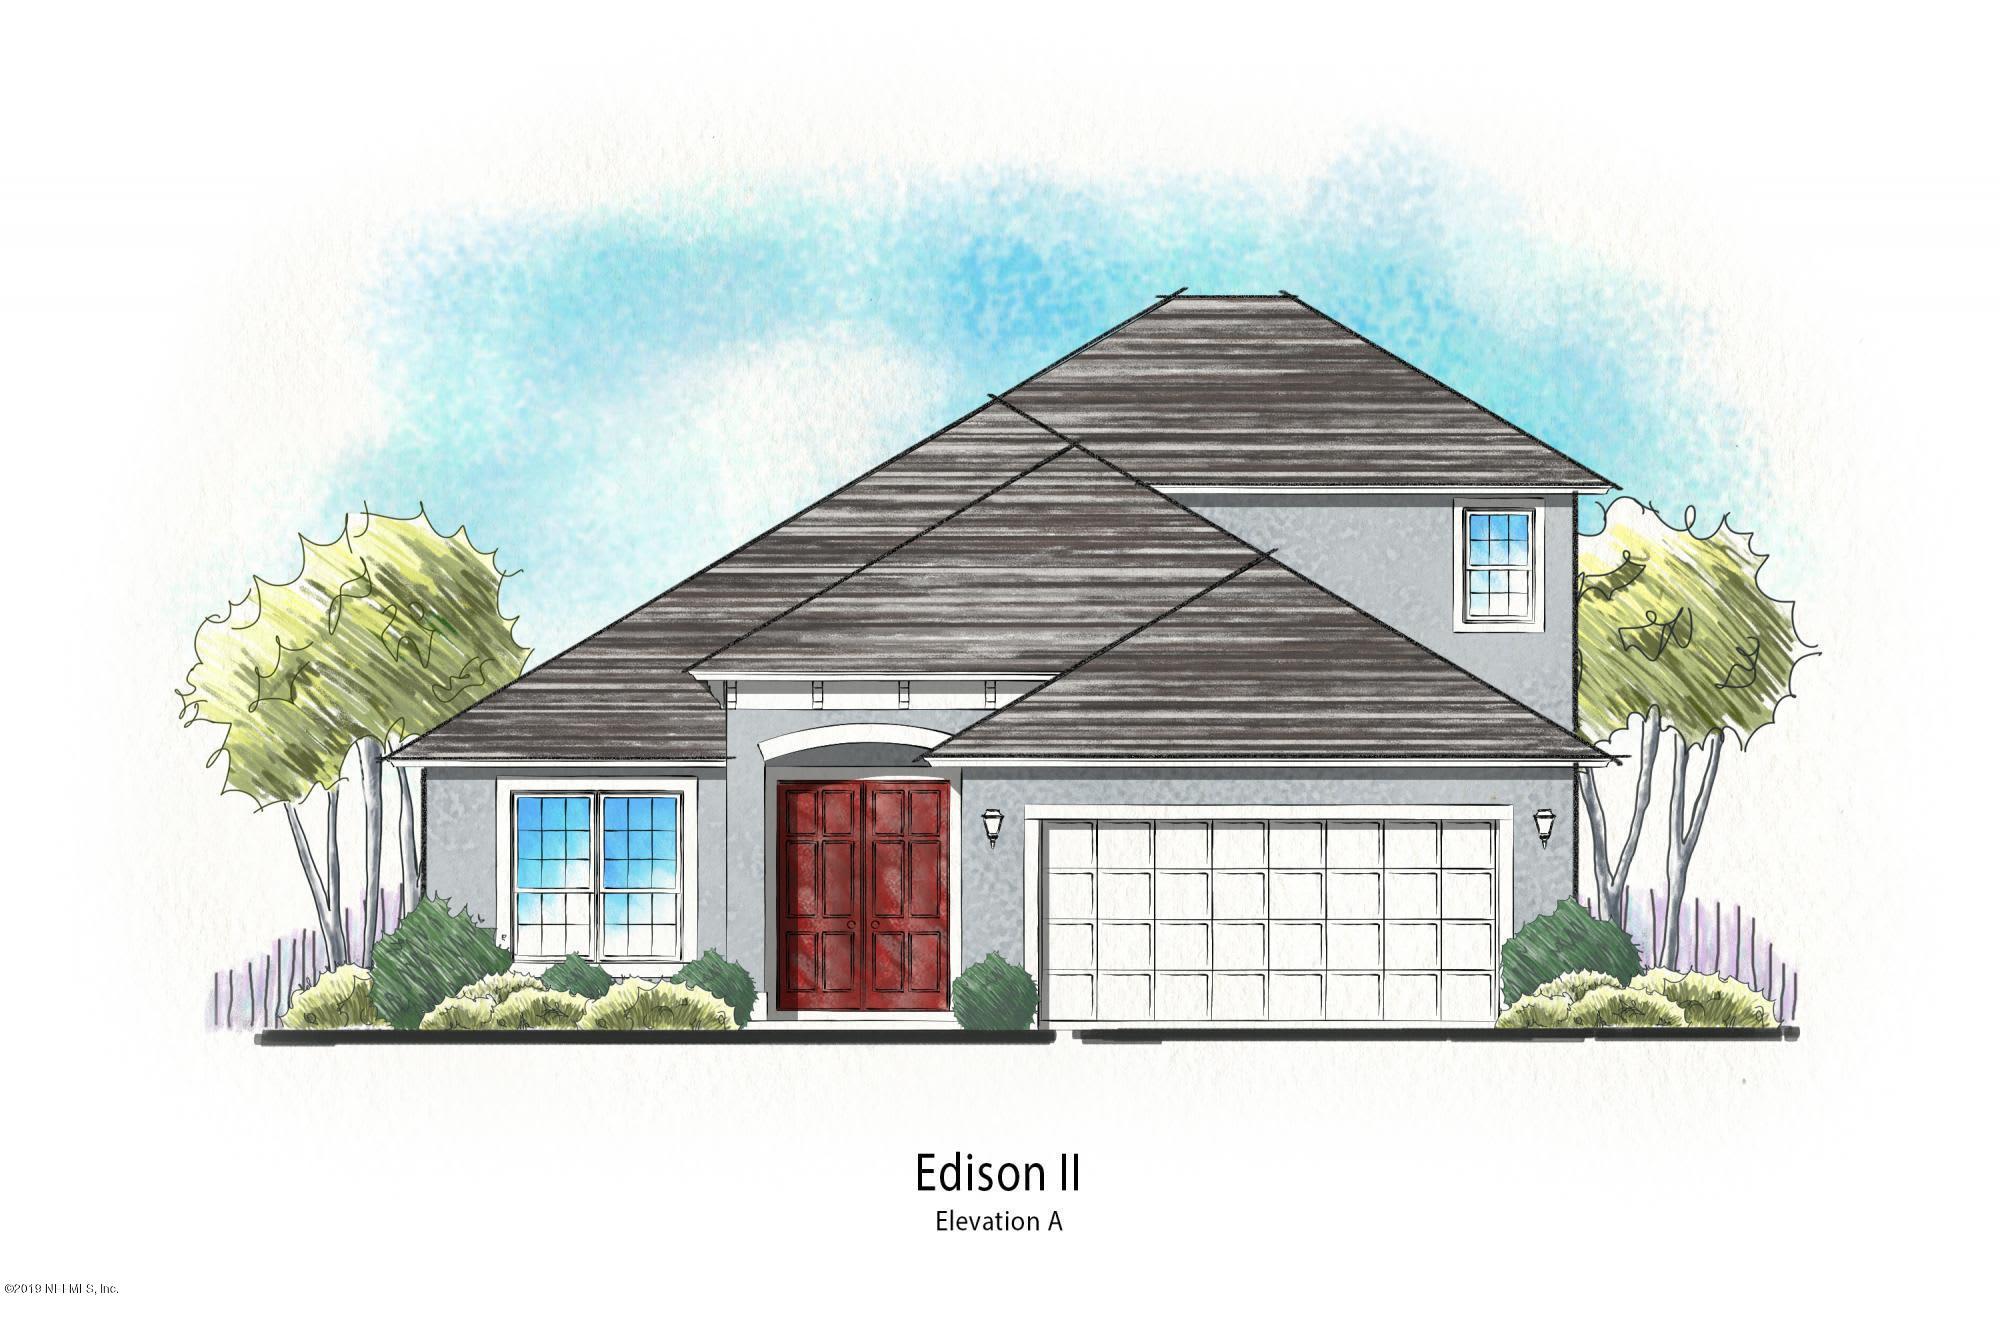 3091 FIRETHORN, ORANGE PARK, FLORIDA 32073, 4 Bedrooms Bedrooms, ,3 BathroomsBathrooms,Residential - single family,For sale,FIRETHORN,979171